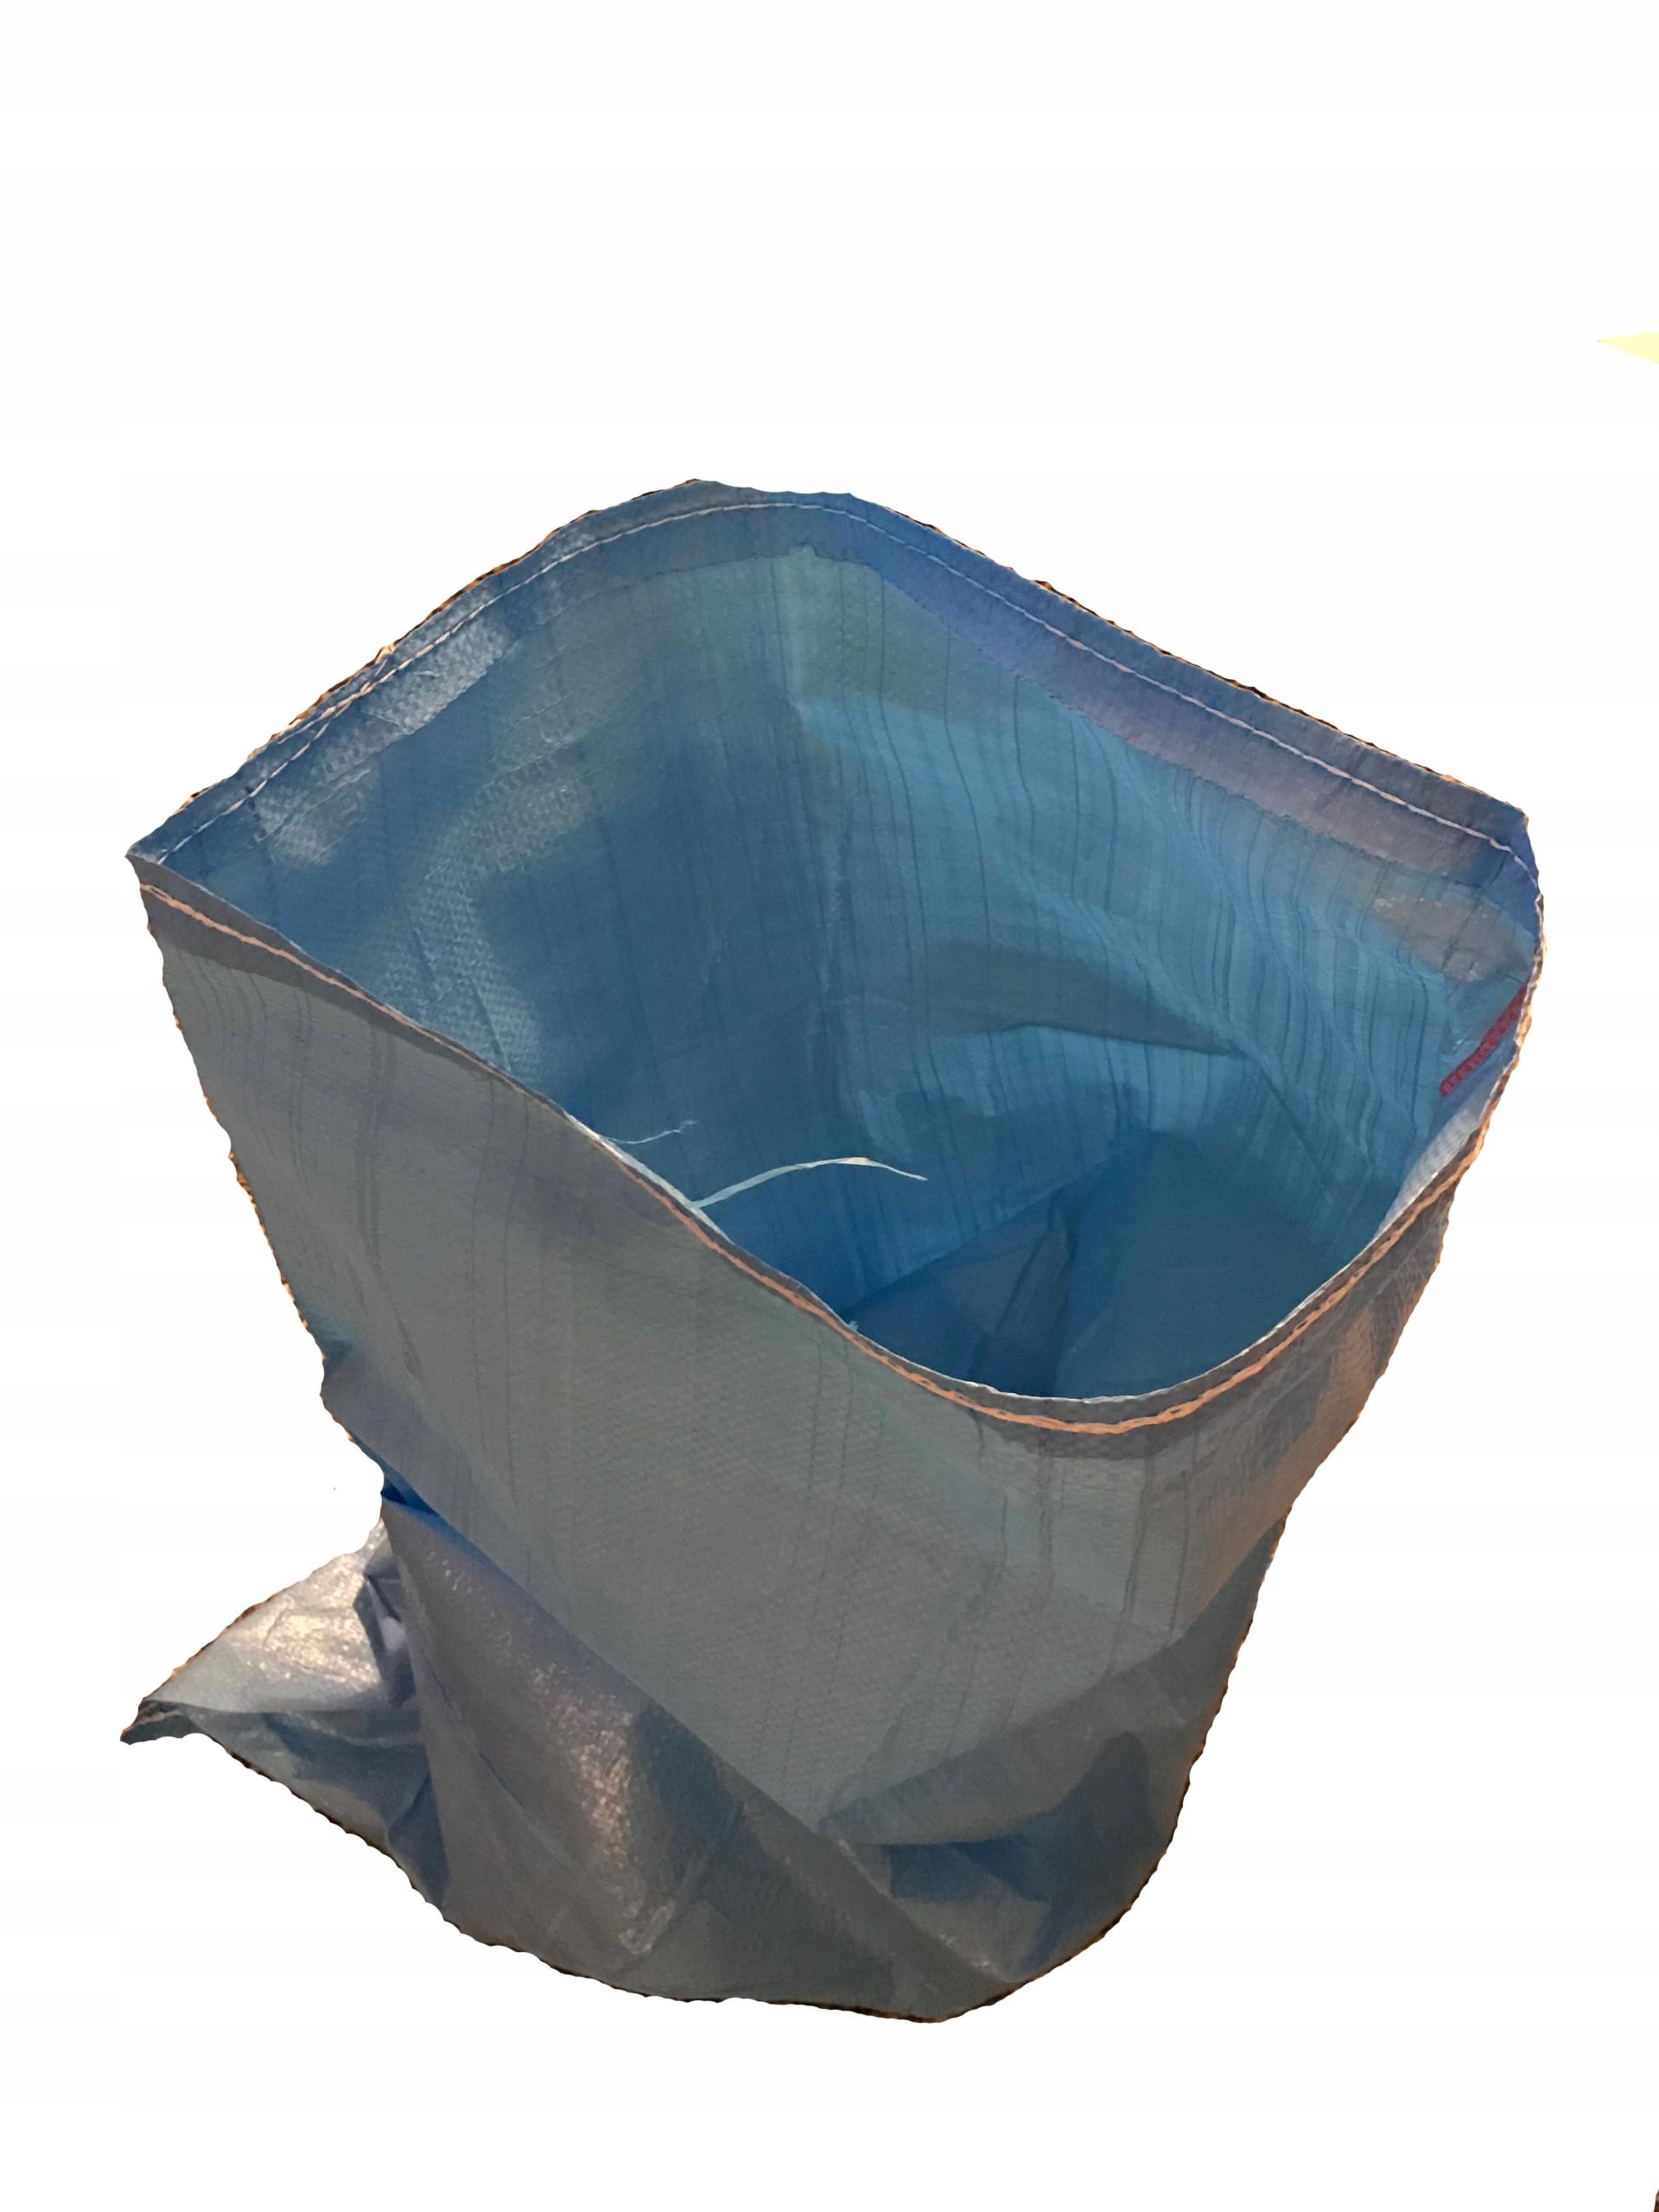 БАГ БАГ ДЛЯ CEREAL COAL FLOUR PP 50x80 30кг